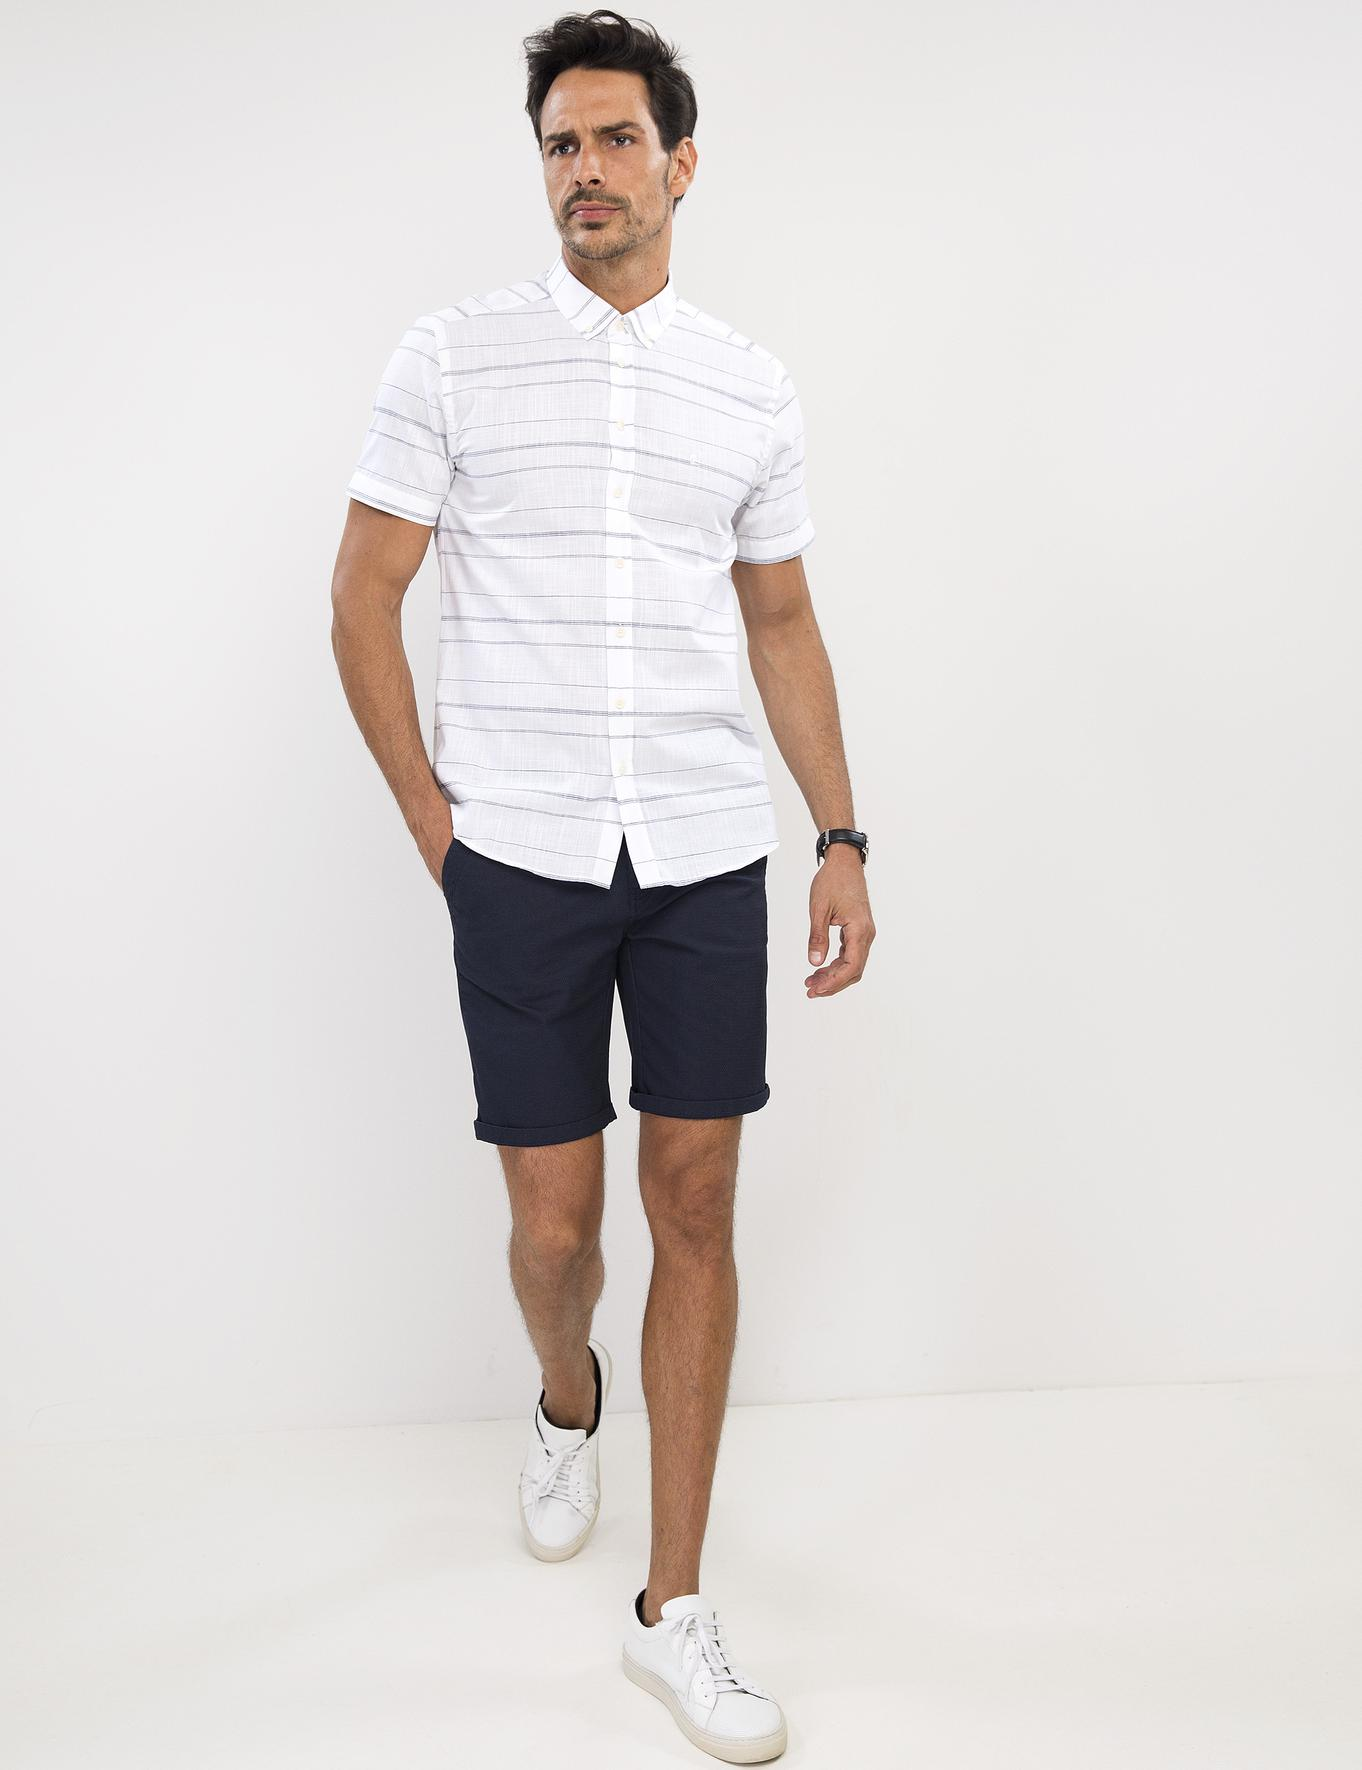 Beyaz Slim Fit Kısa Kollu Gömlek